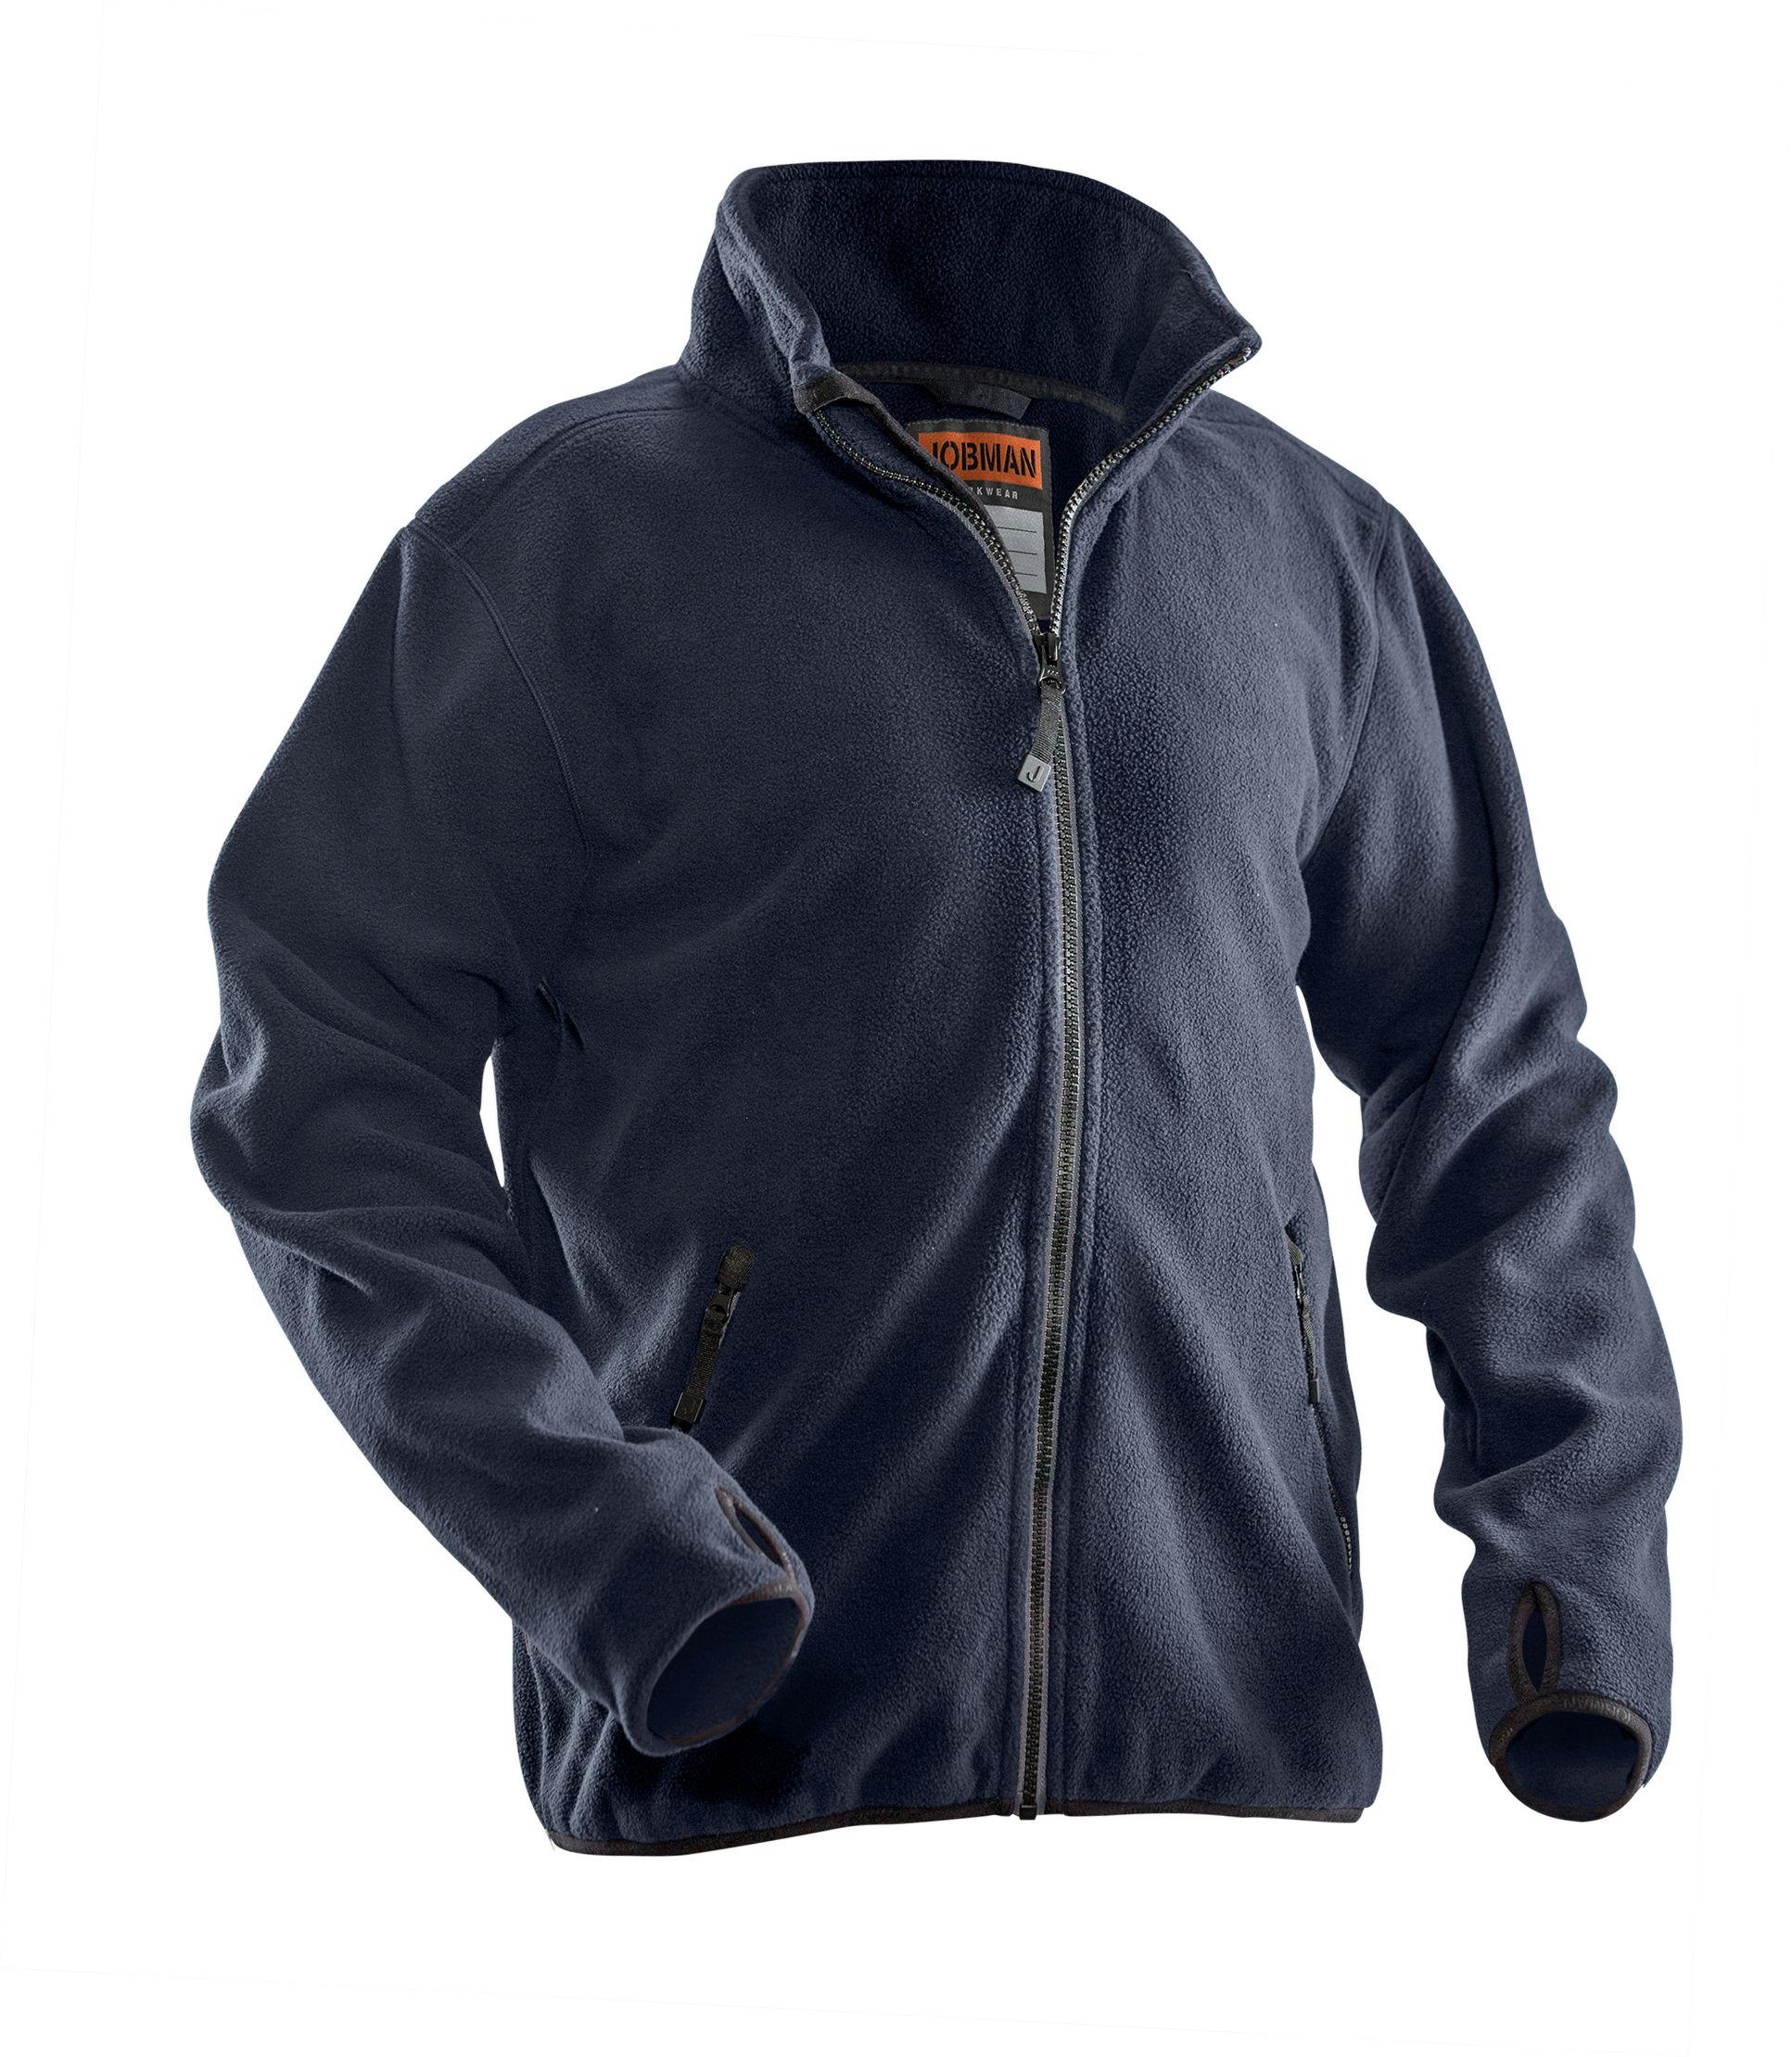 Fleece Jacke Jobman 5501 PRACTICAL, PSA-Kategorie I